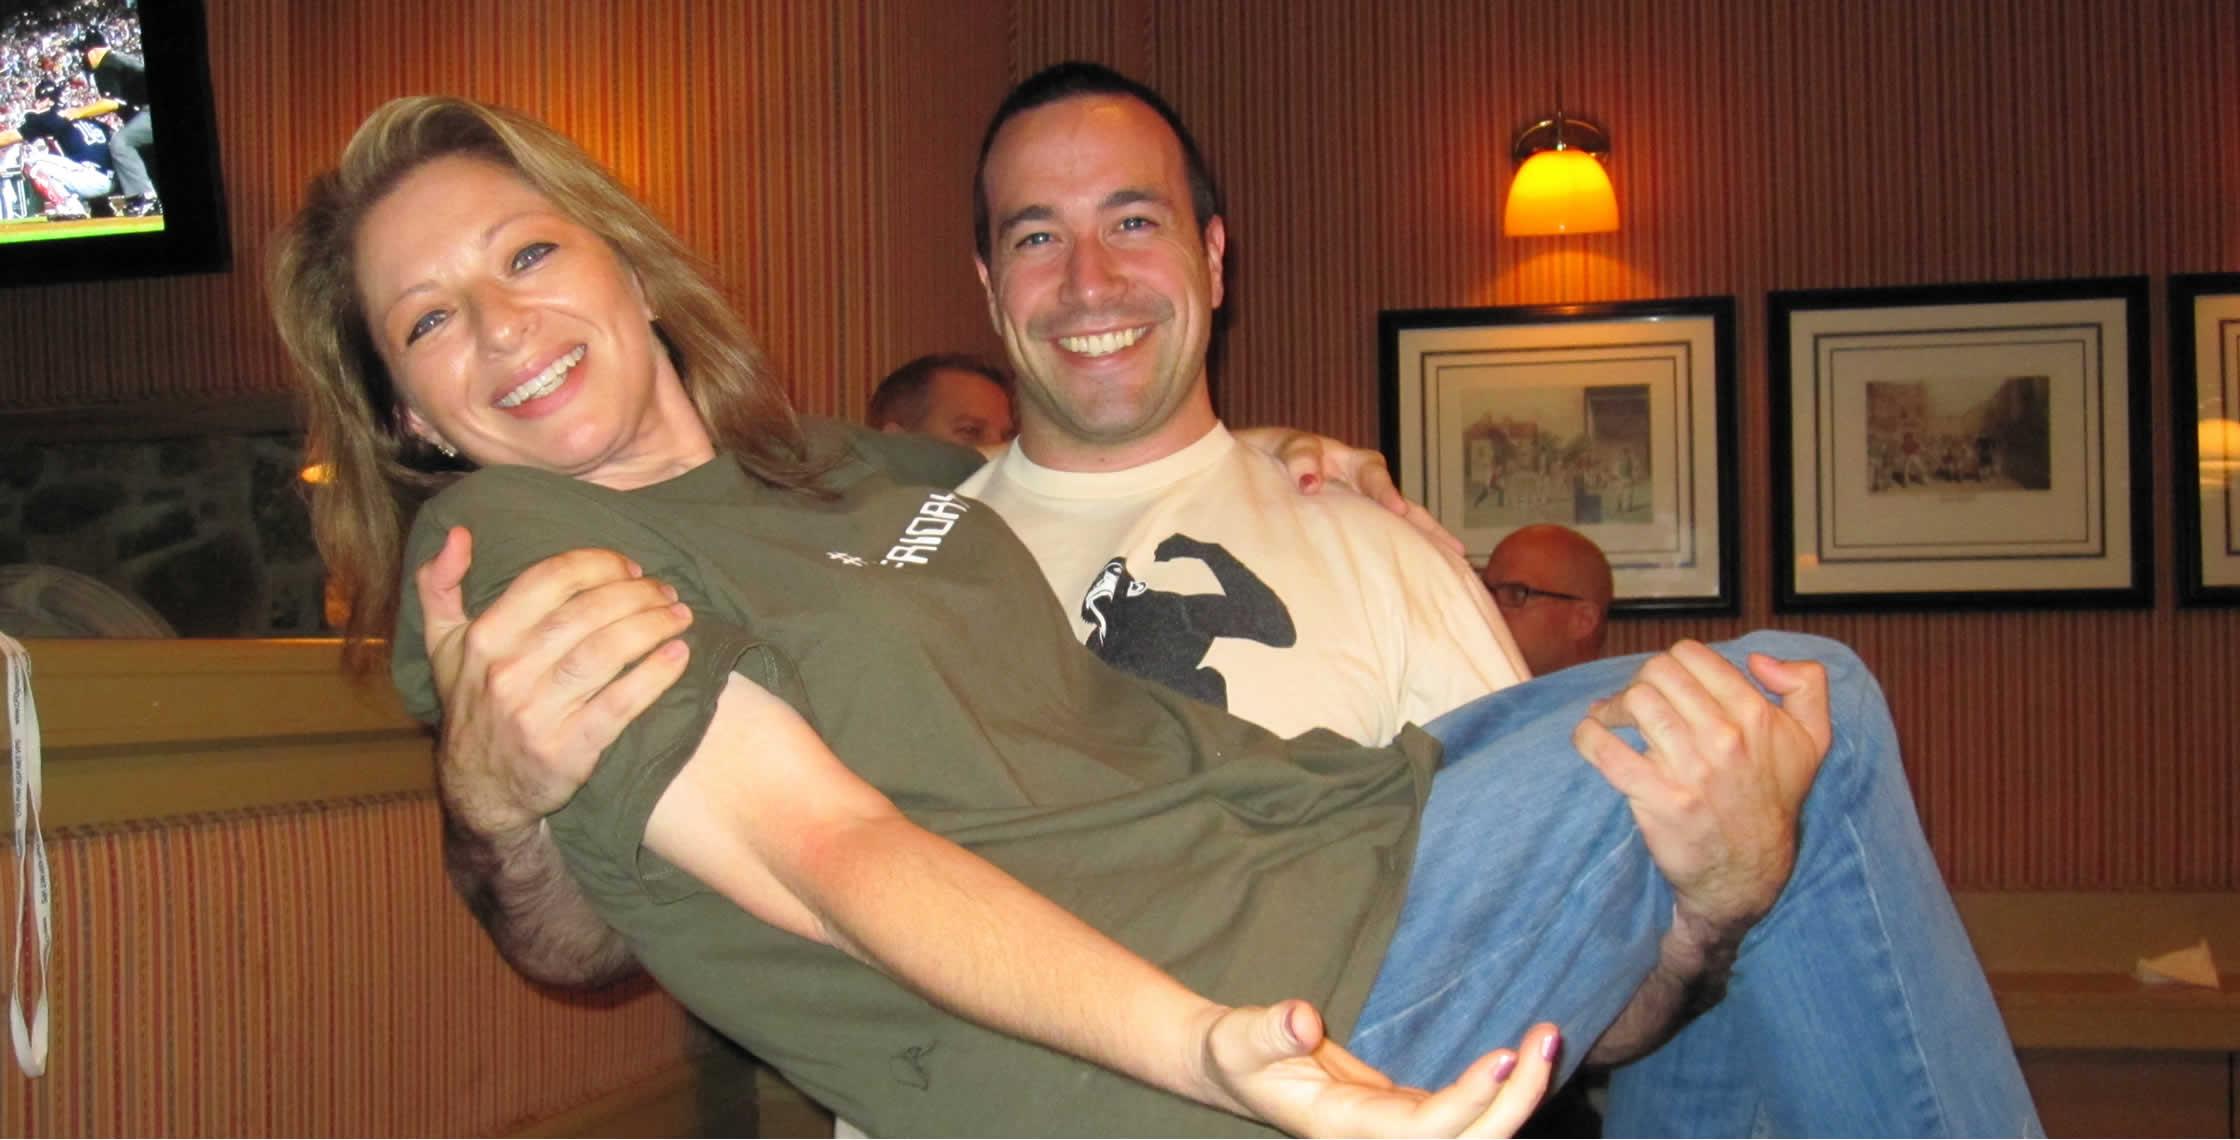 Ben Nadel at CFUNITED 2010 (Landsdown, VA) with: Vicky Ryder